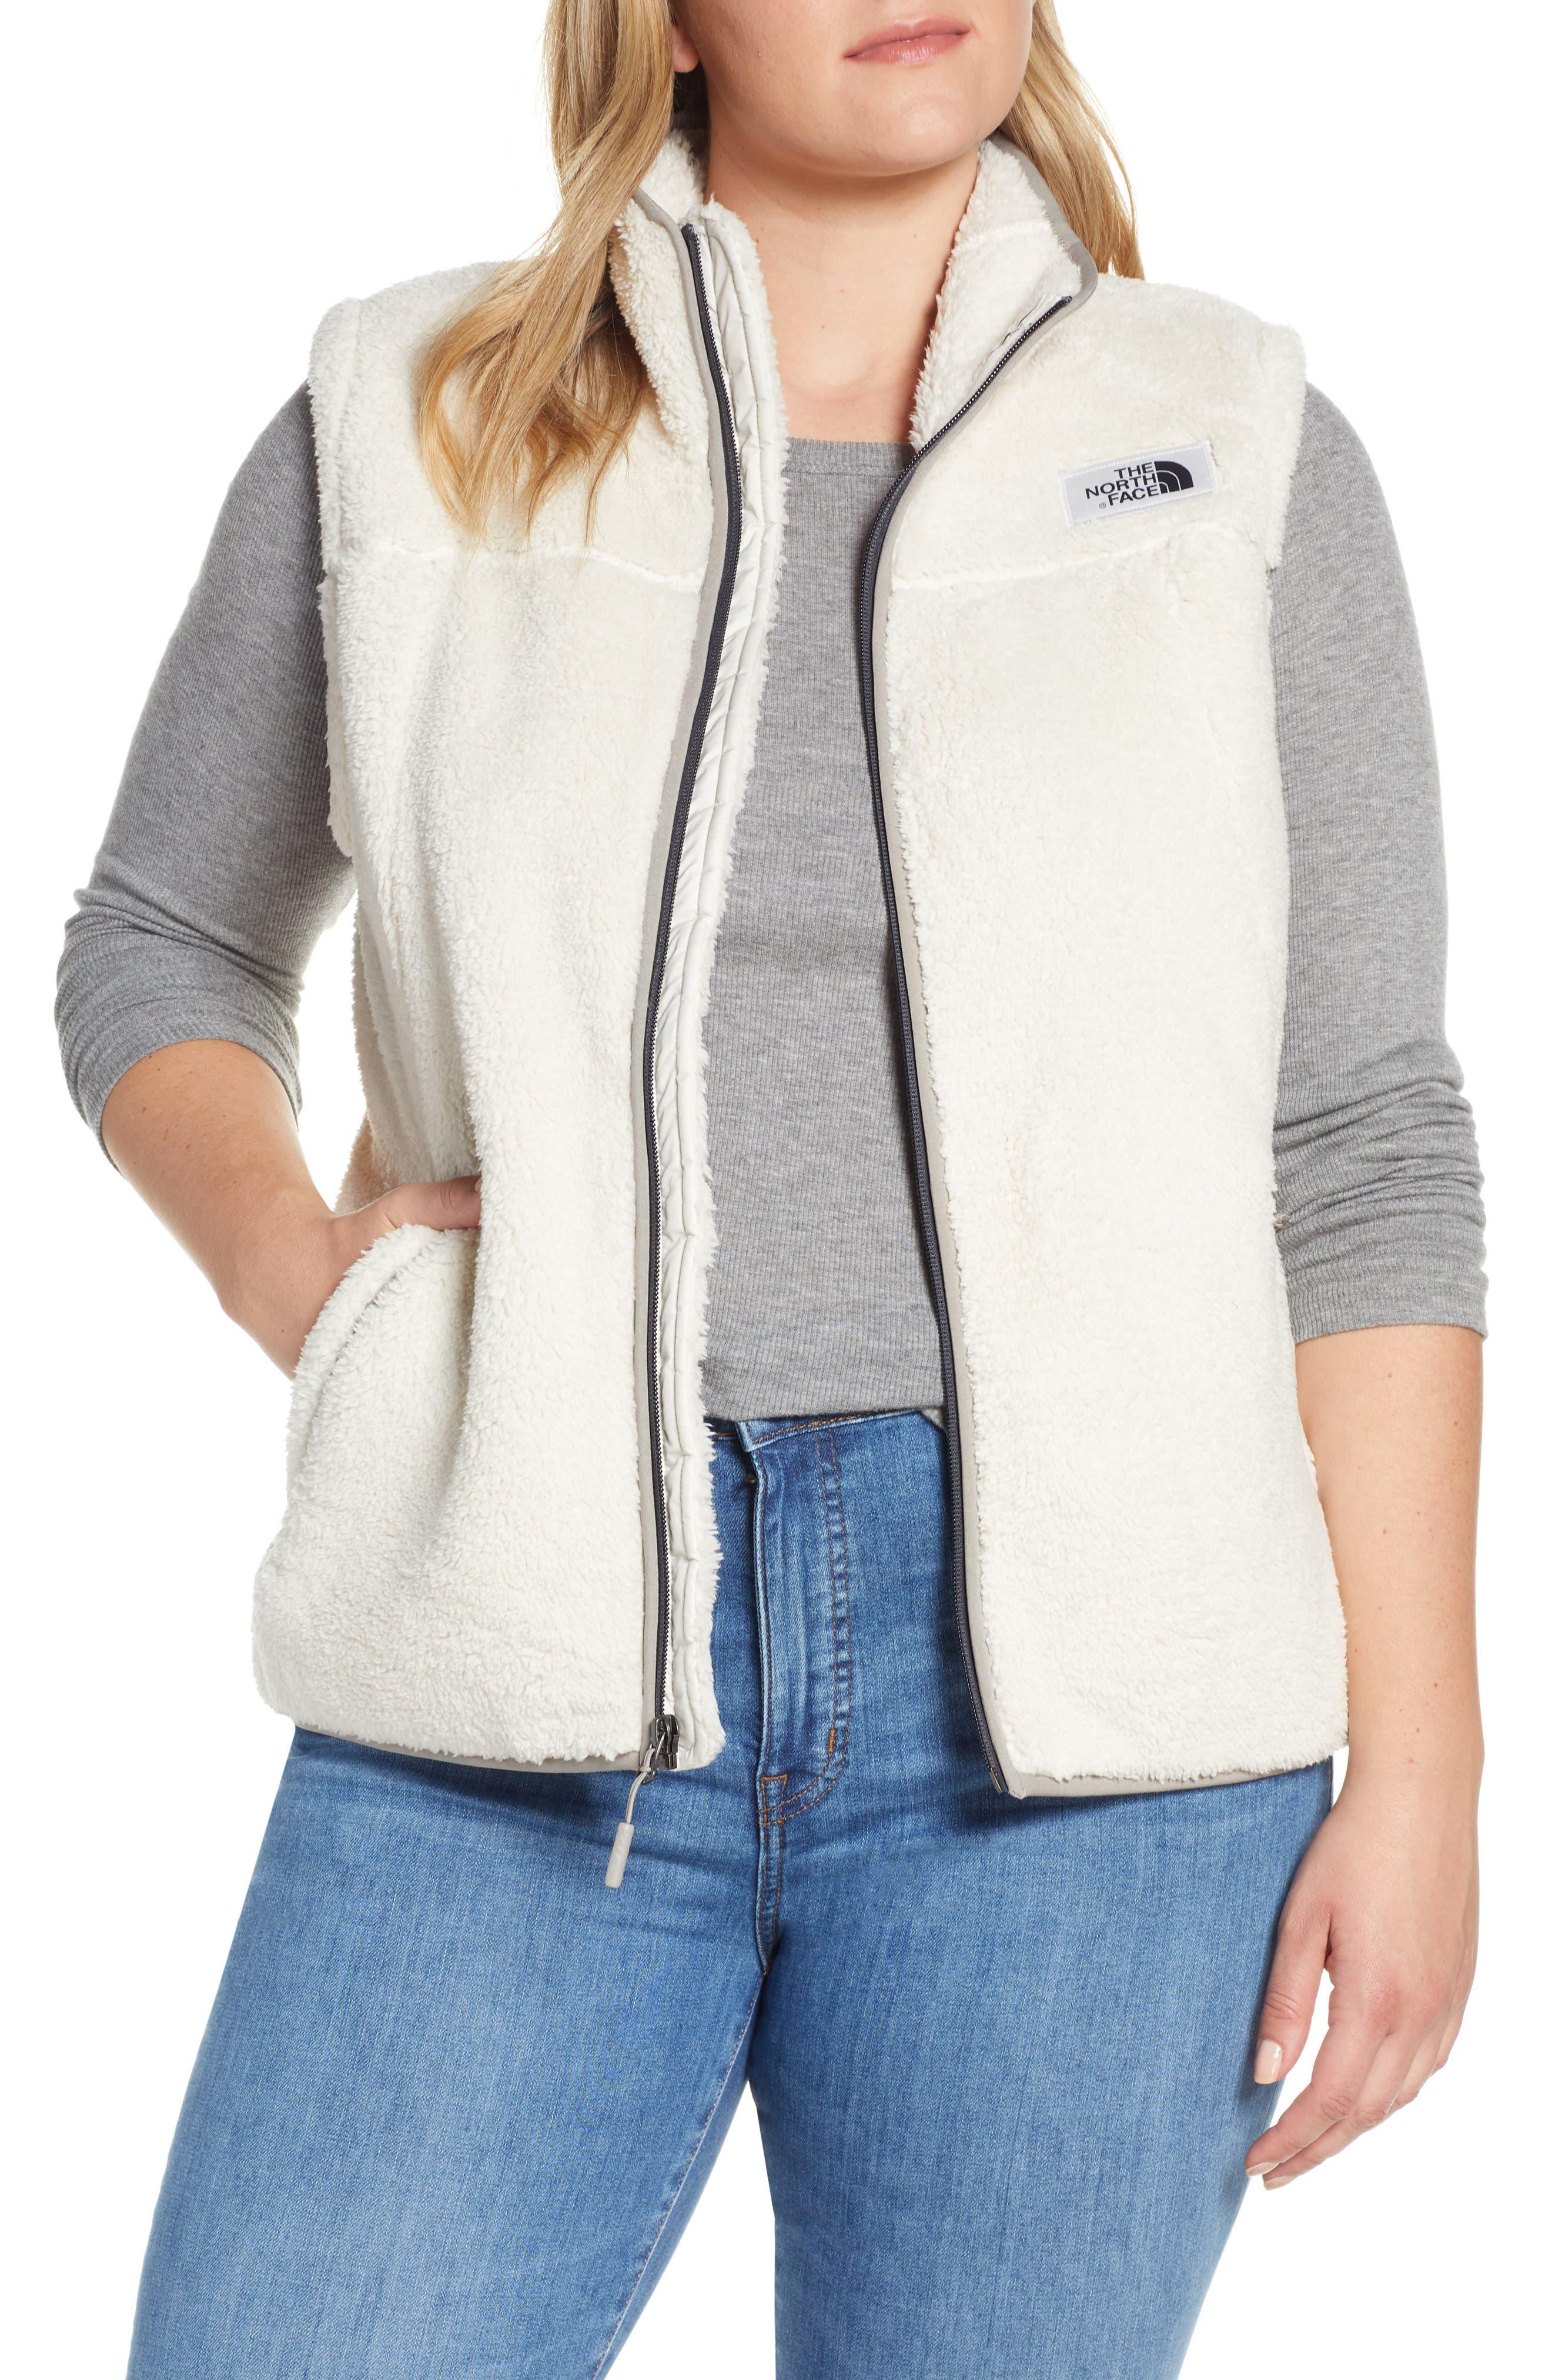 THE NORTH FACE Campshire Fleece Vest, Main, color, VINTAGE WHITE/ GREY